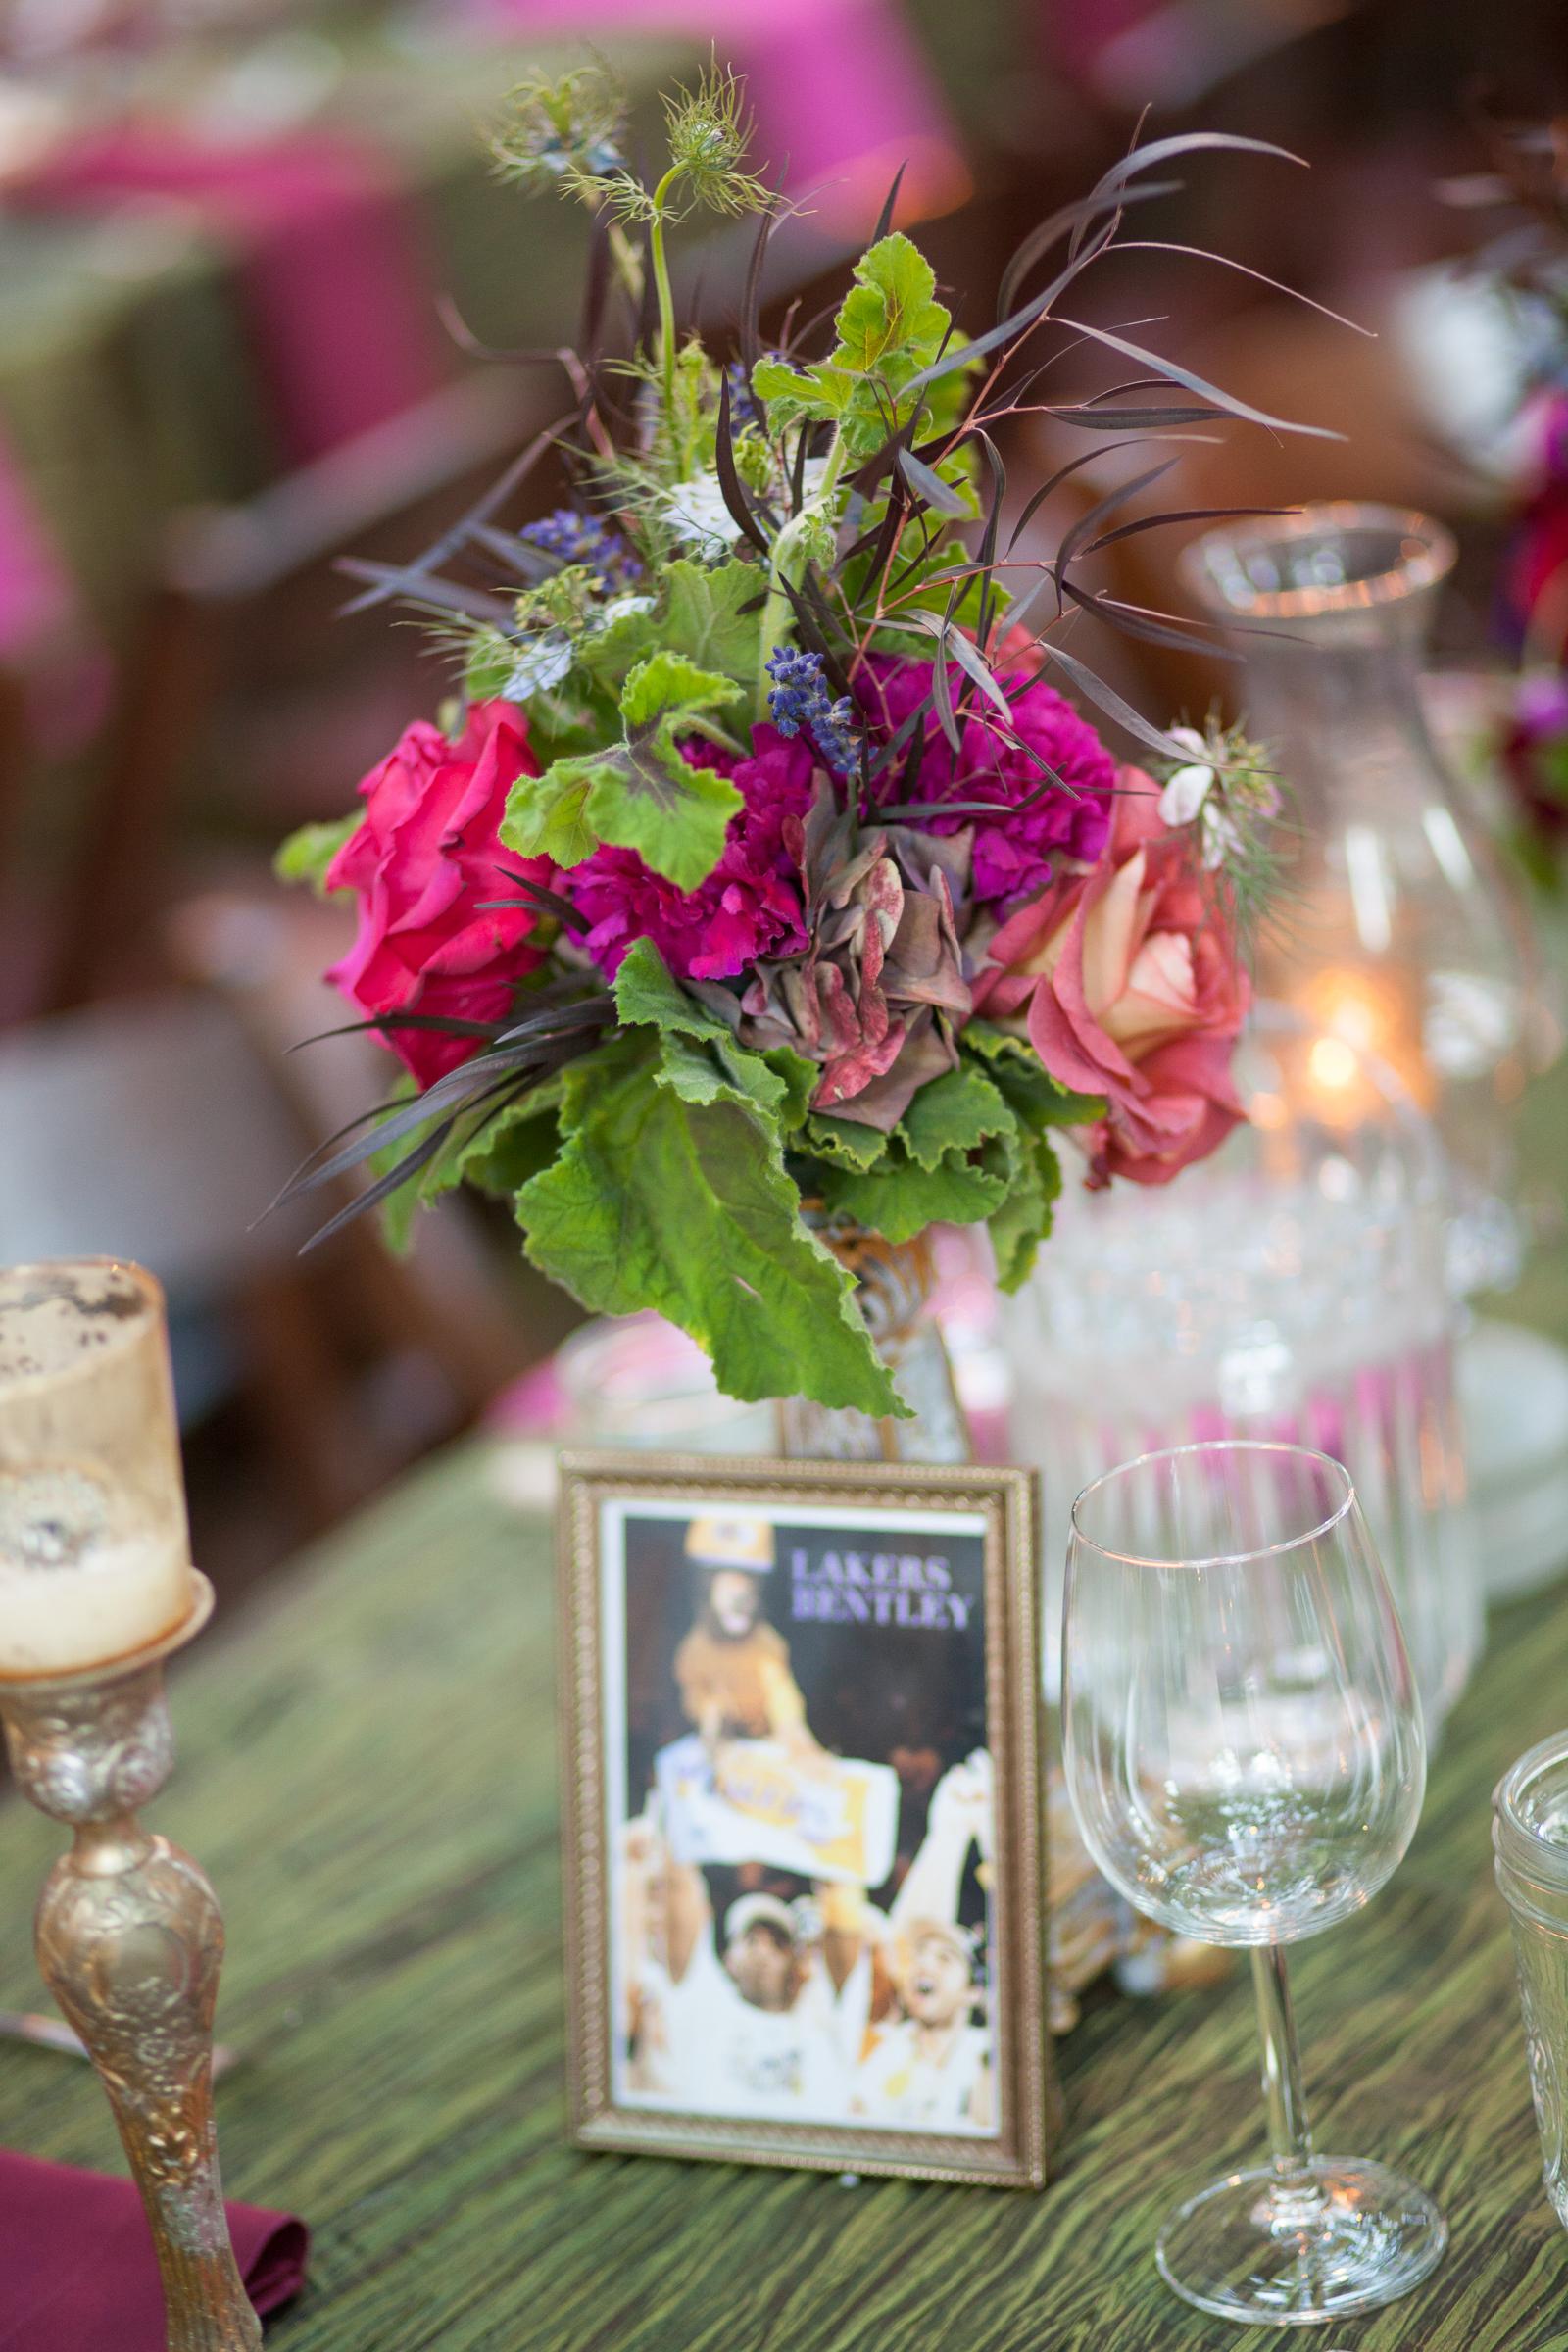 magnoliaeventdesign.com | A Wedding at Circle Bar B Ranch Photographed by Melissa Musgrove | Magnolia Event Design | Santa Barbara Wedding Planning and Design